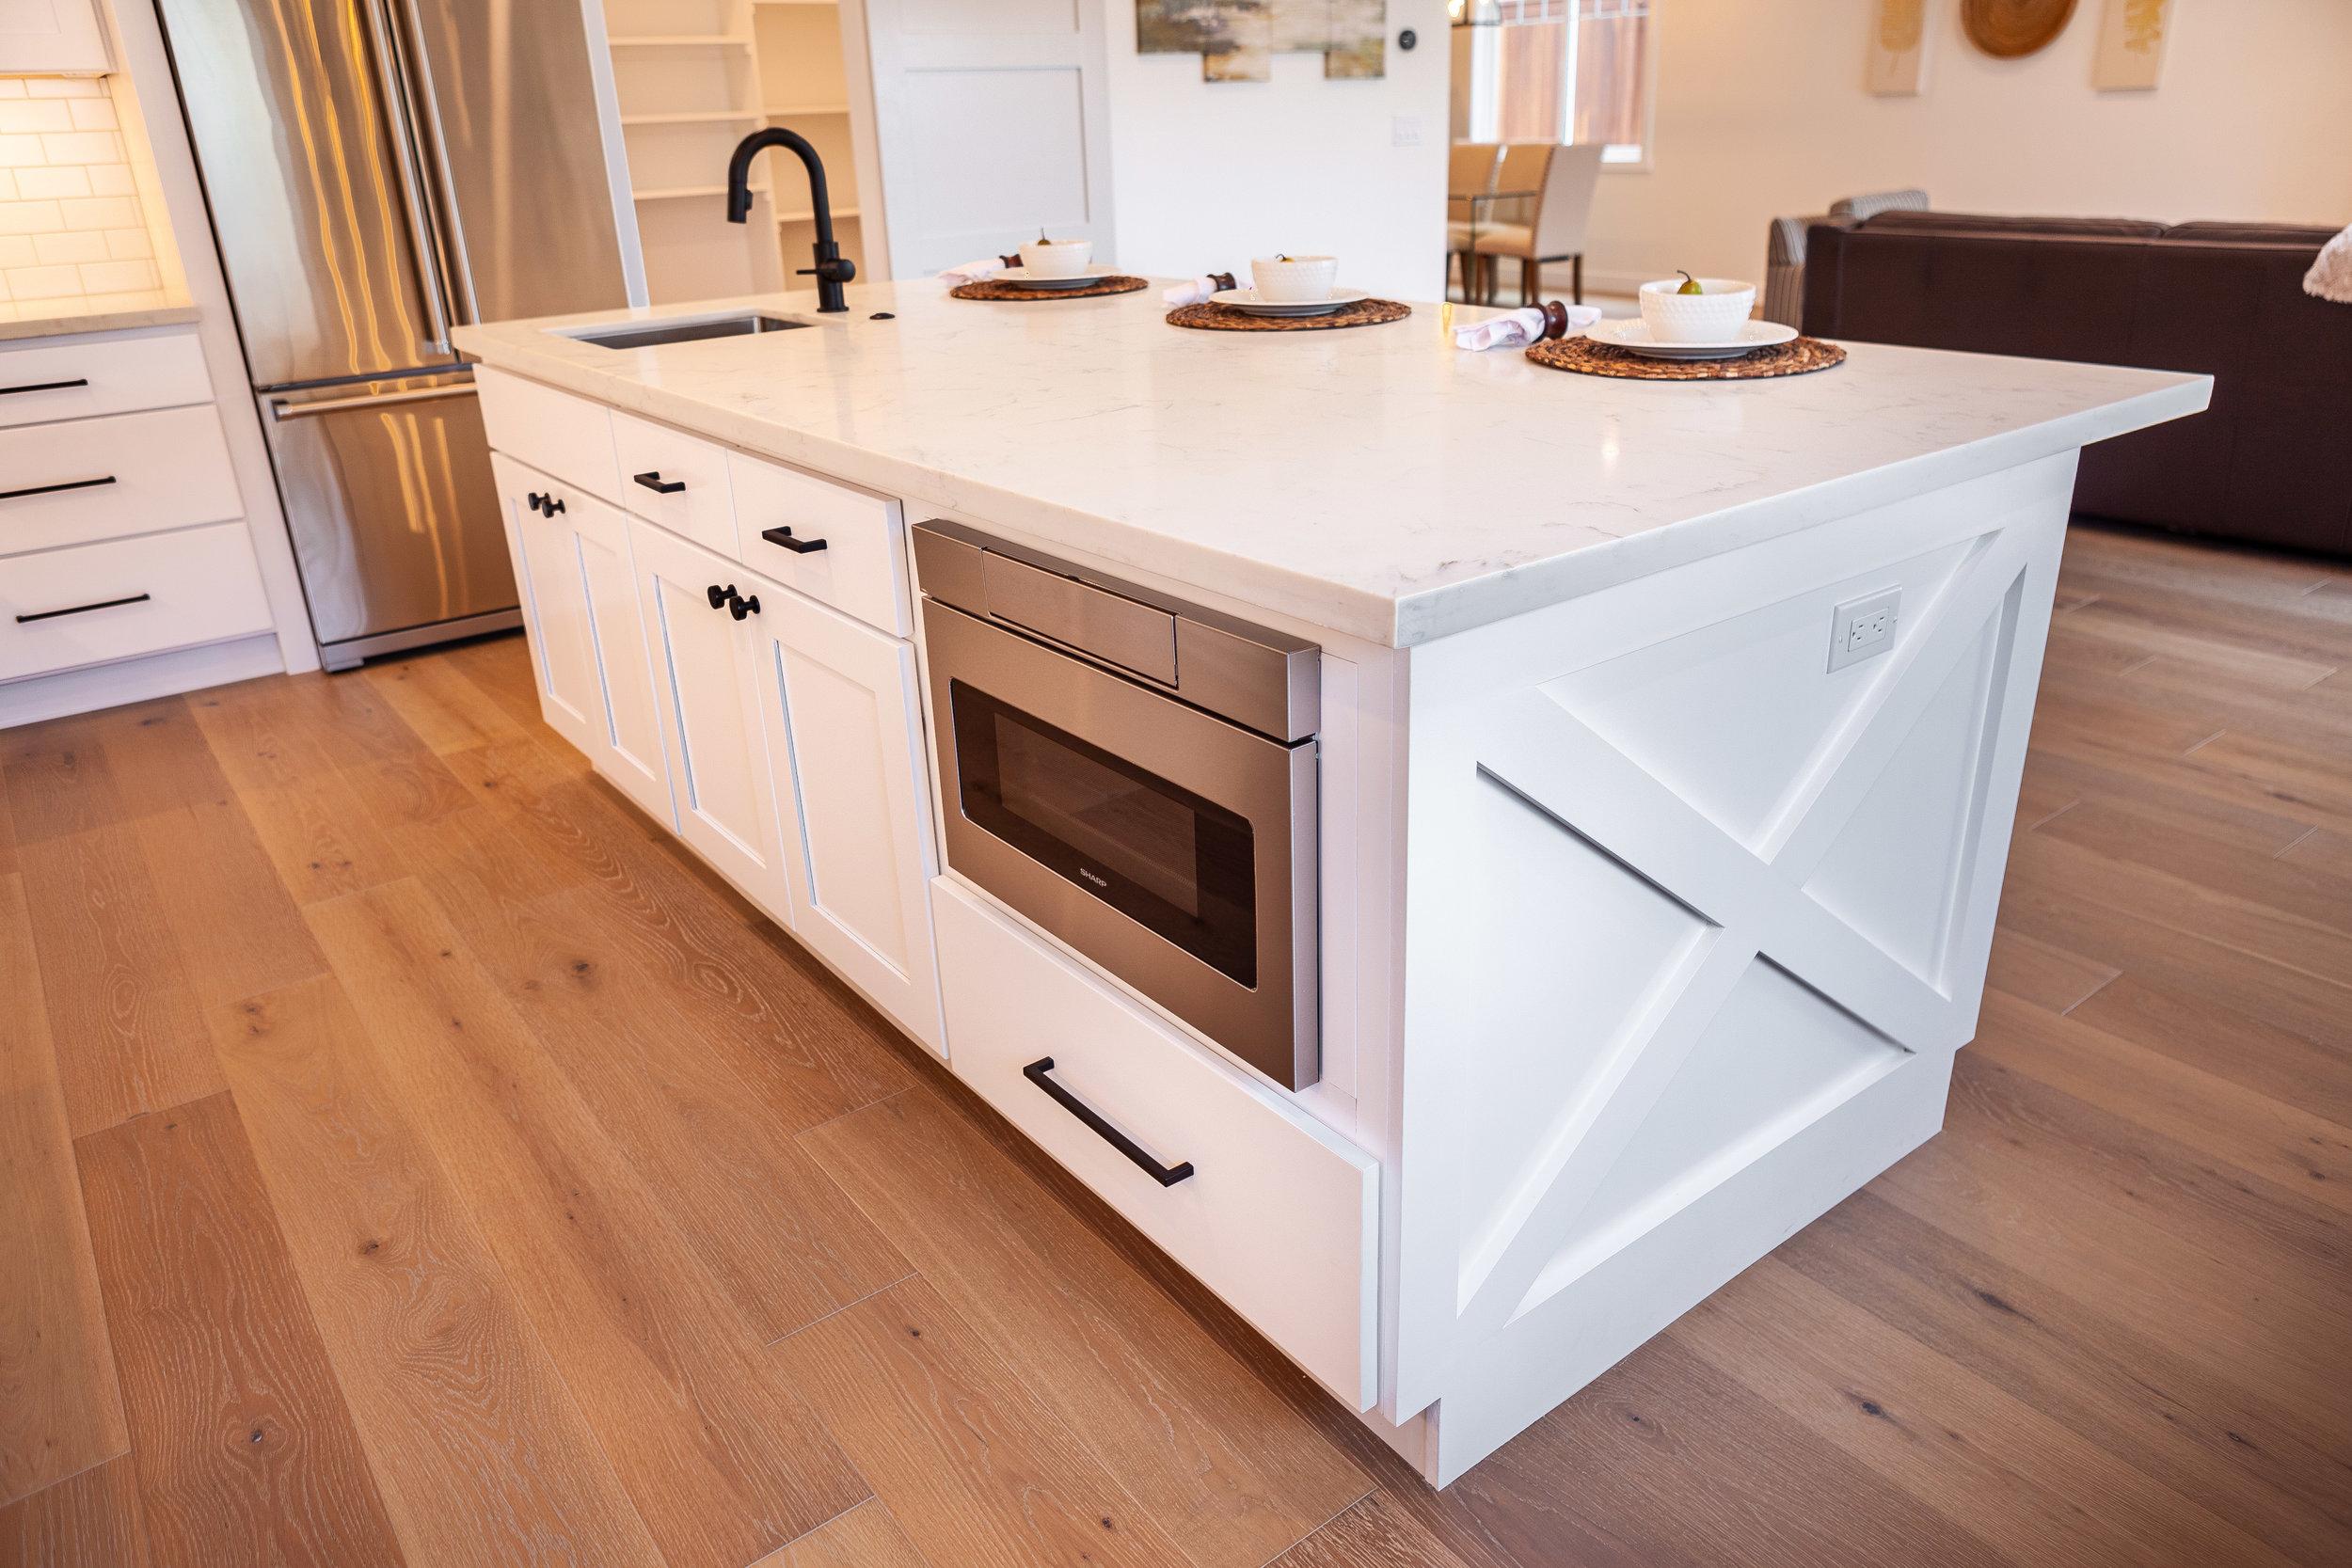 KitchenPortraitIsland.jpg